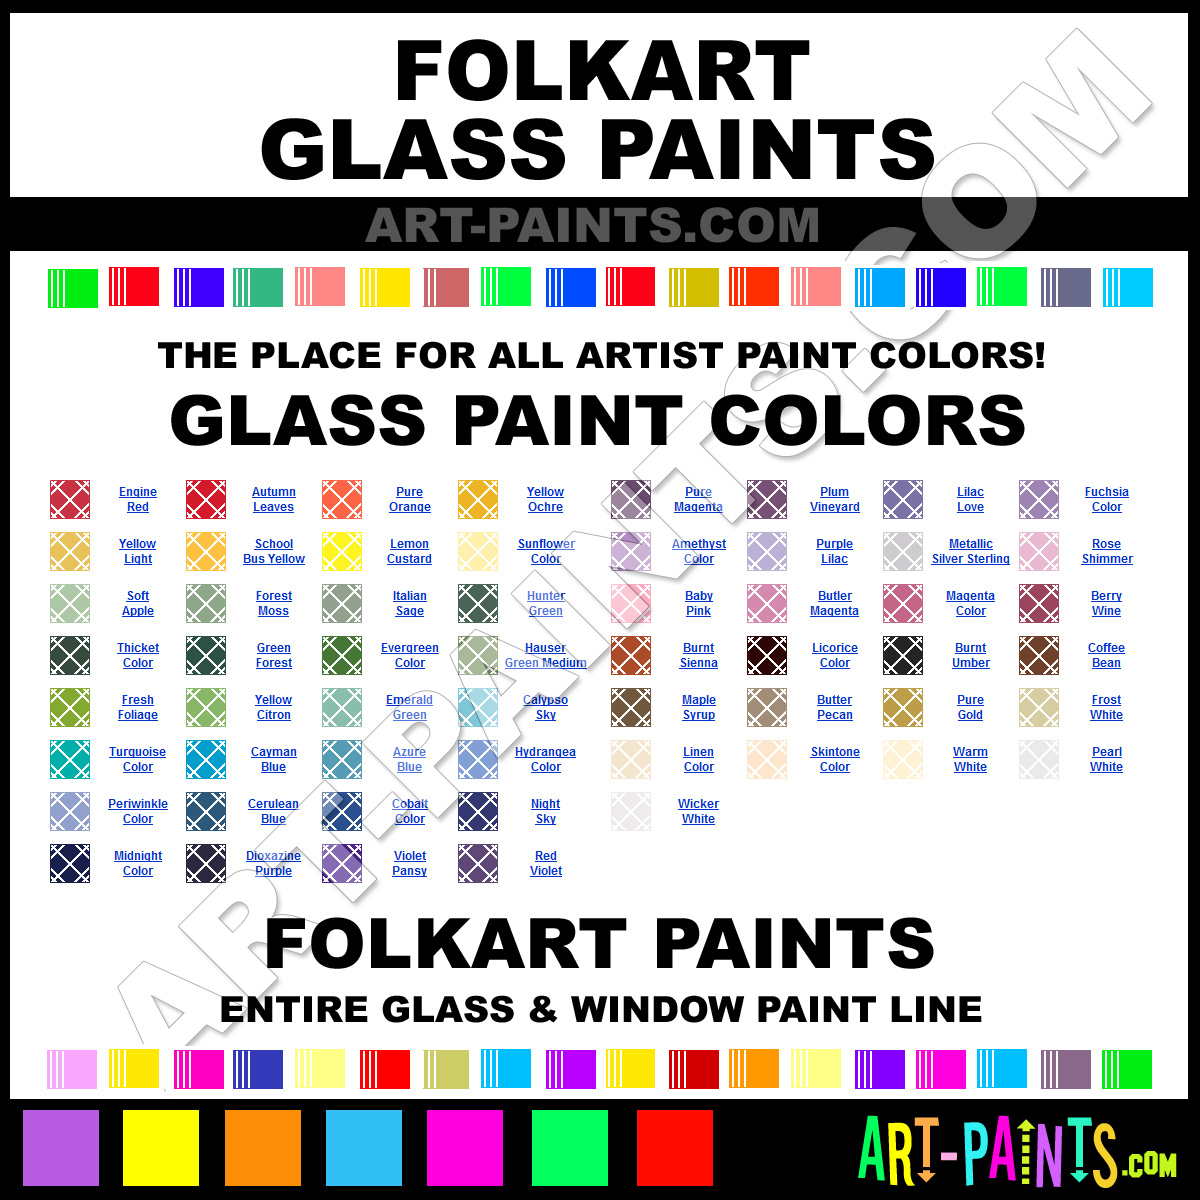 Folk art acrylic paint color chart - Folkart Glass Paints